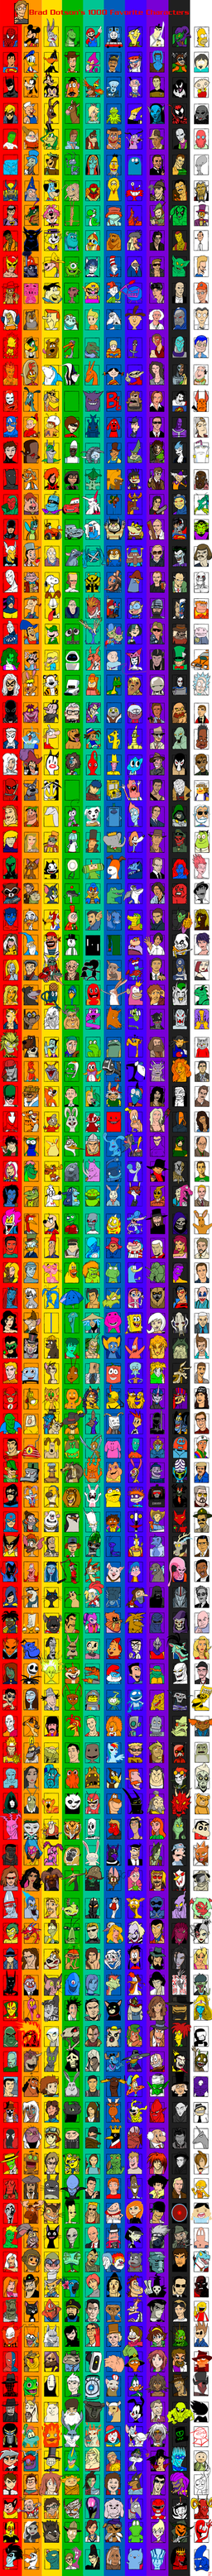 Brad Dotson's 1000 Character Meme by TheZoologist